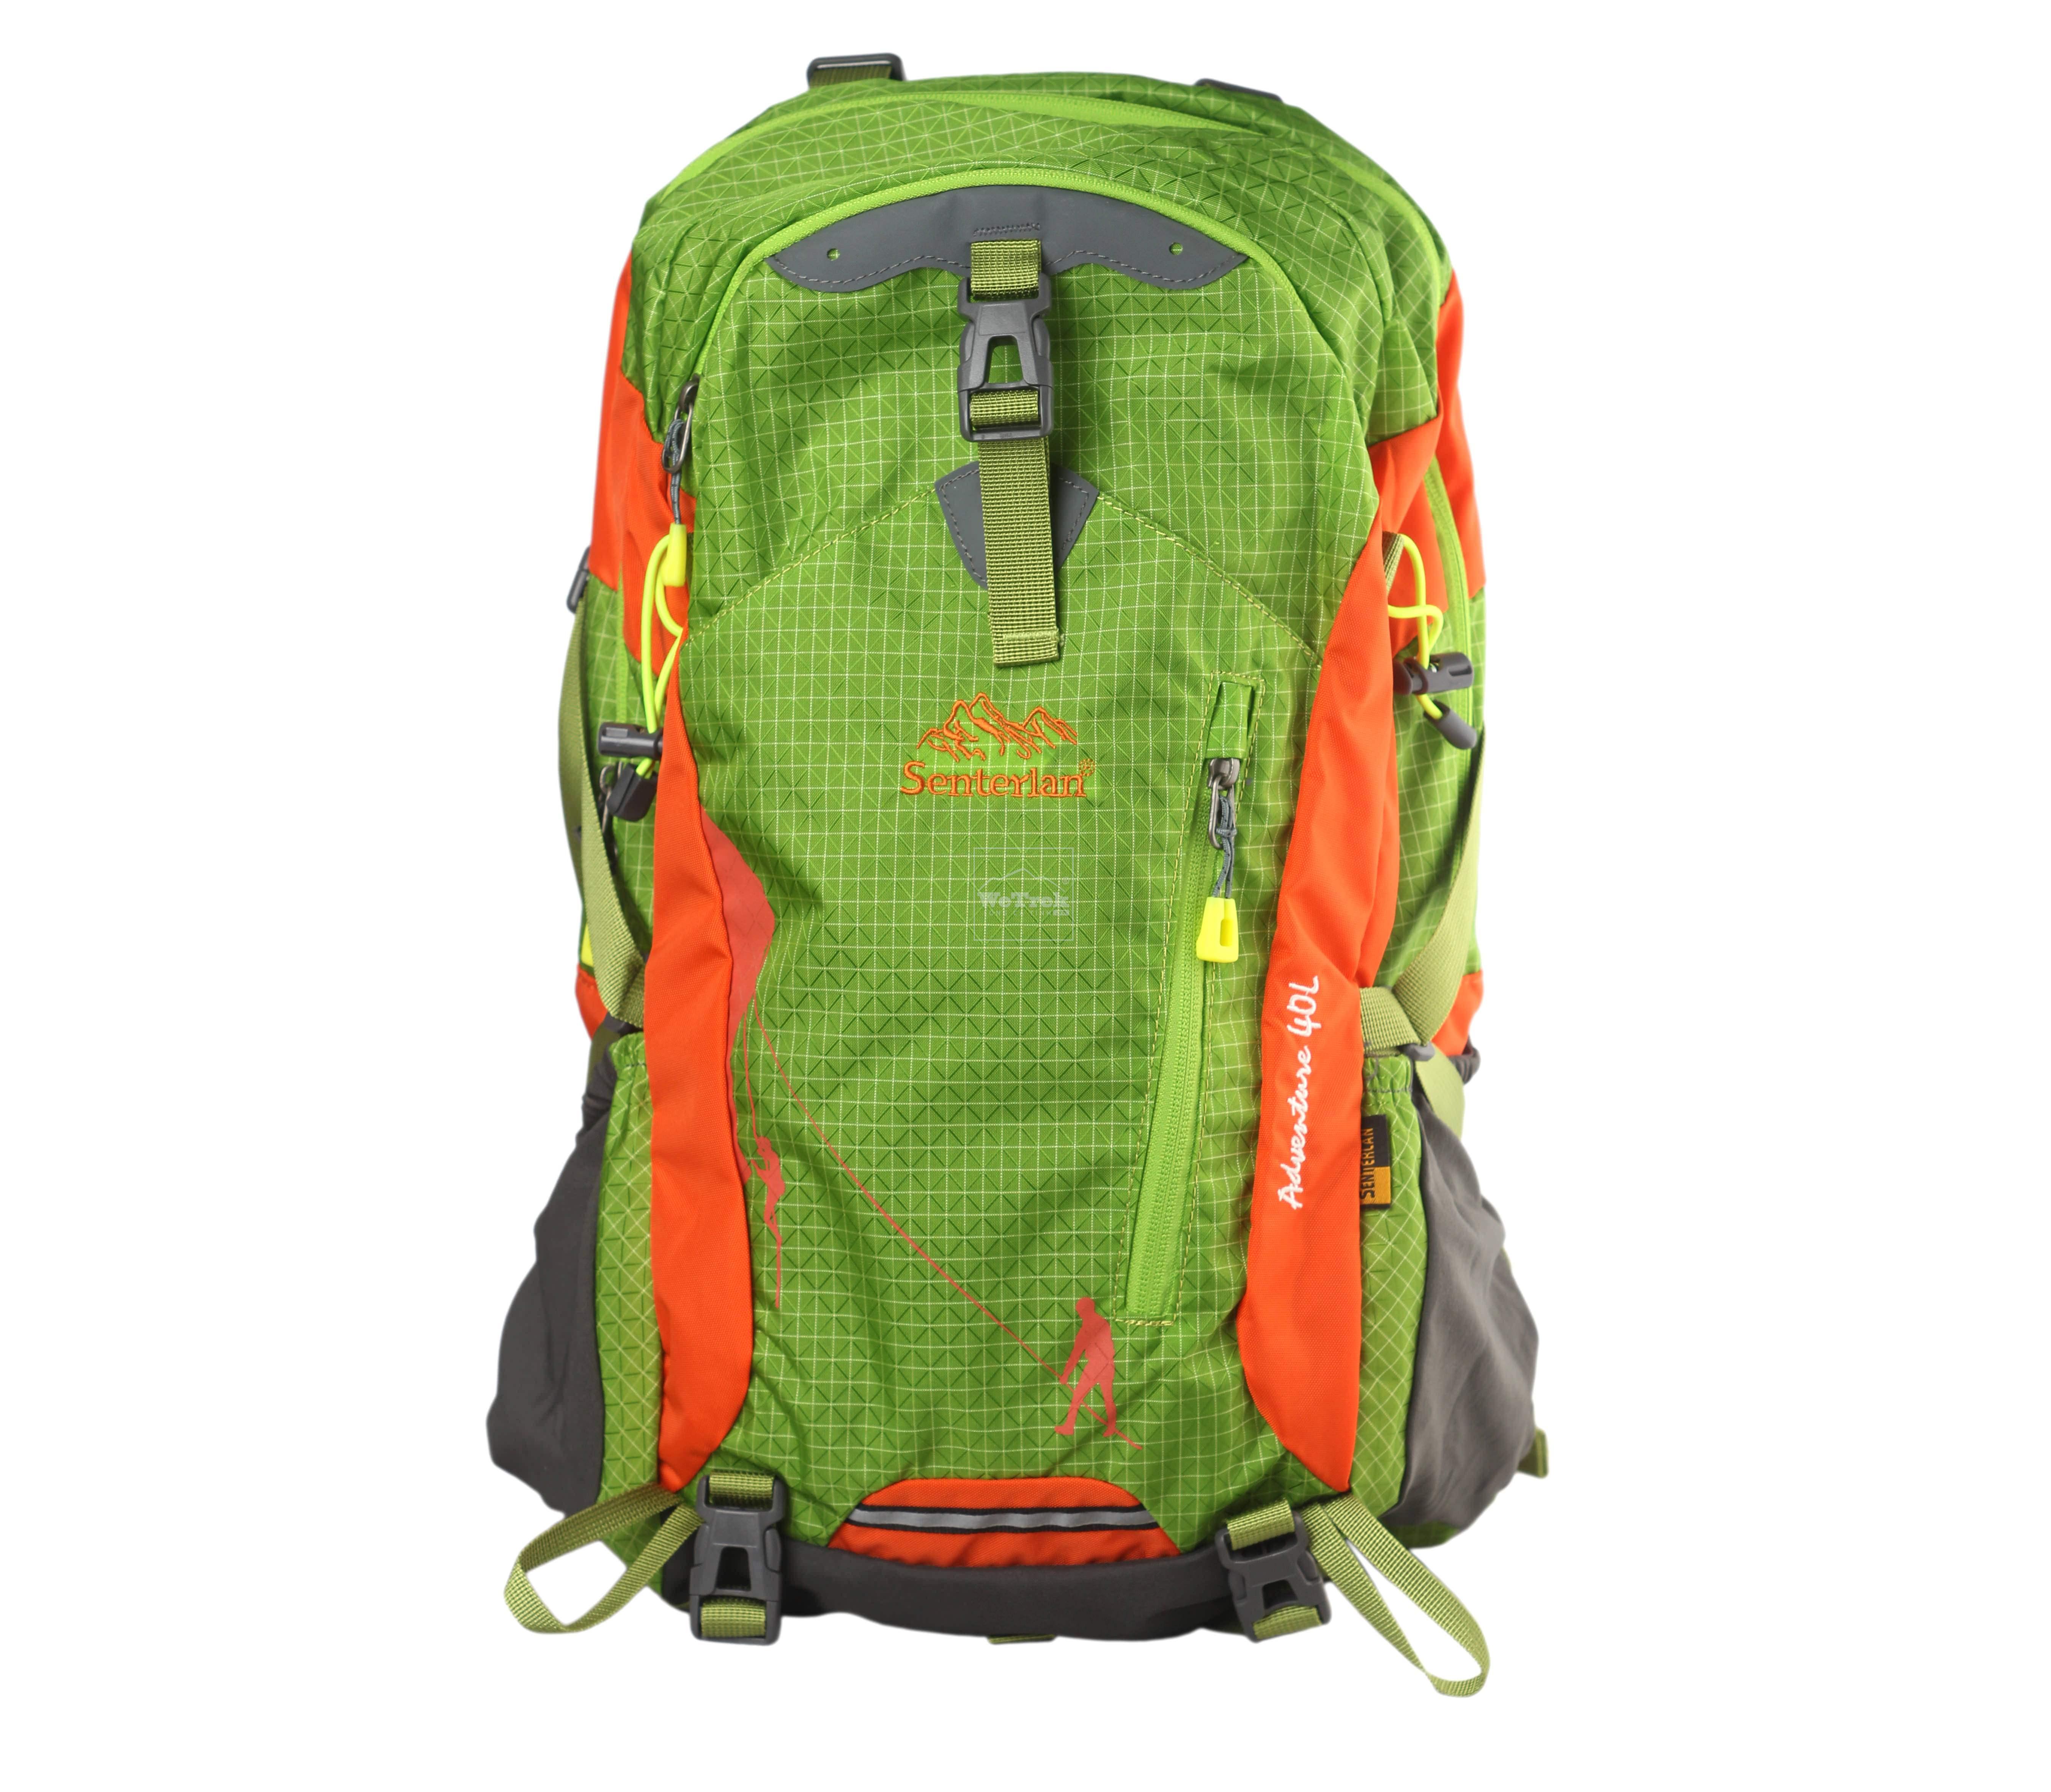 Balo leo núi Senterlan Adventure 40L S2467 Green - 5672